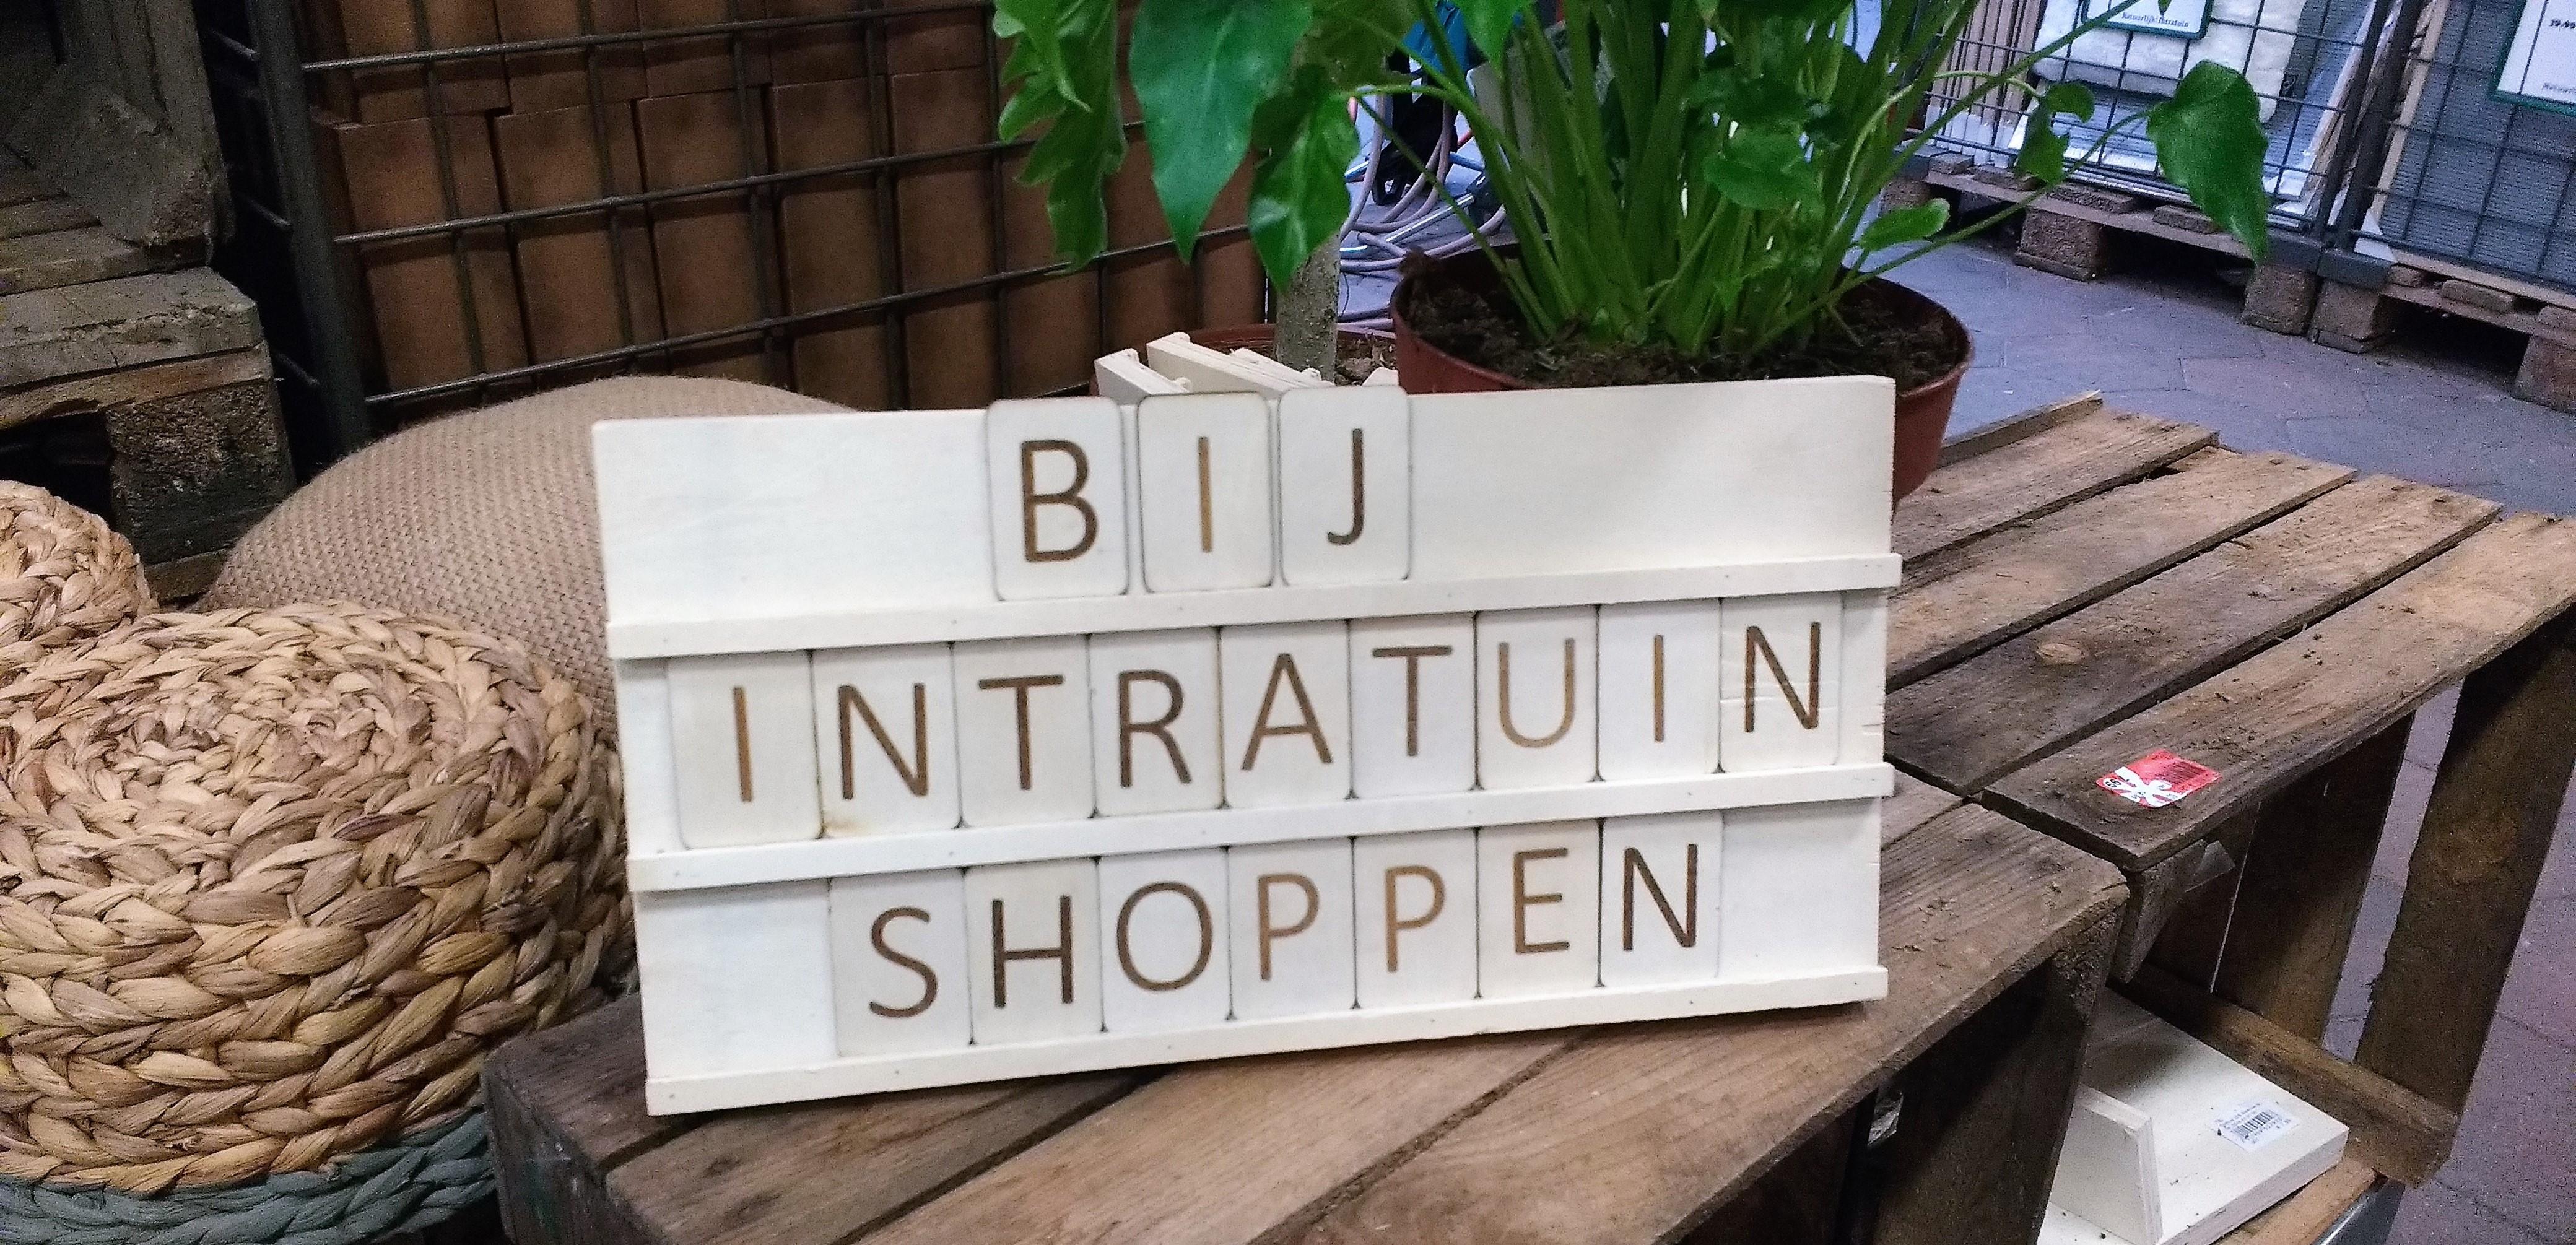 intratuin, shoppen, inspiratie, interieur, wonen, blog, lifestyleblog, mamablog, mamalifestyle blog, la log.nl